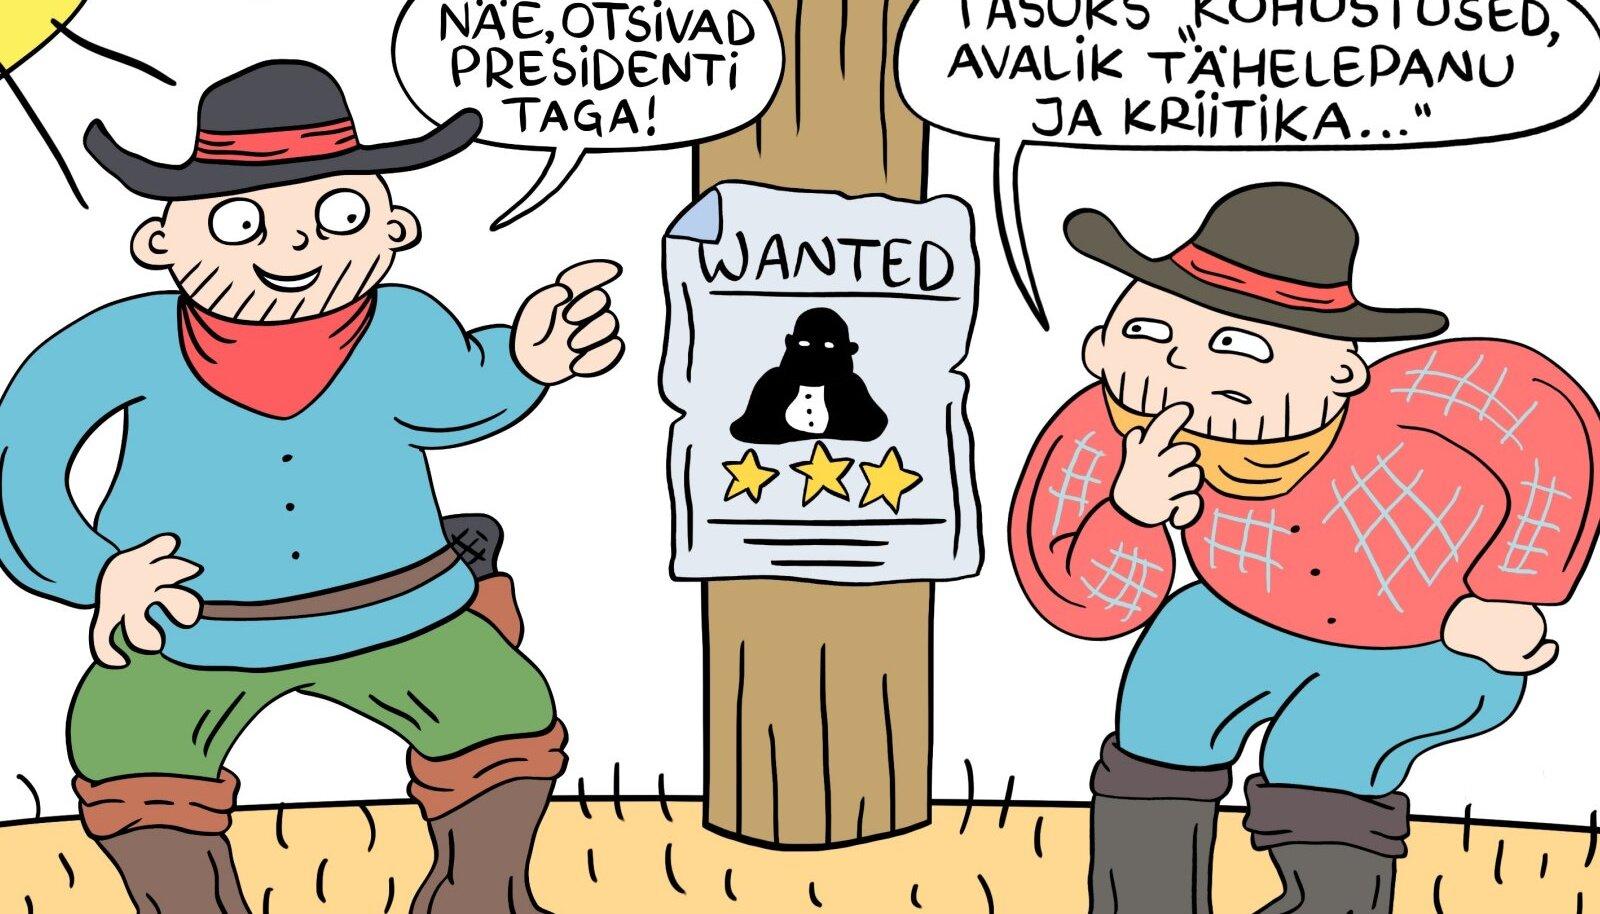 Wanted – Eesti president!